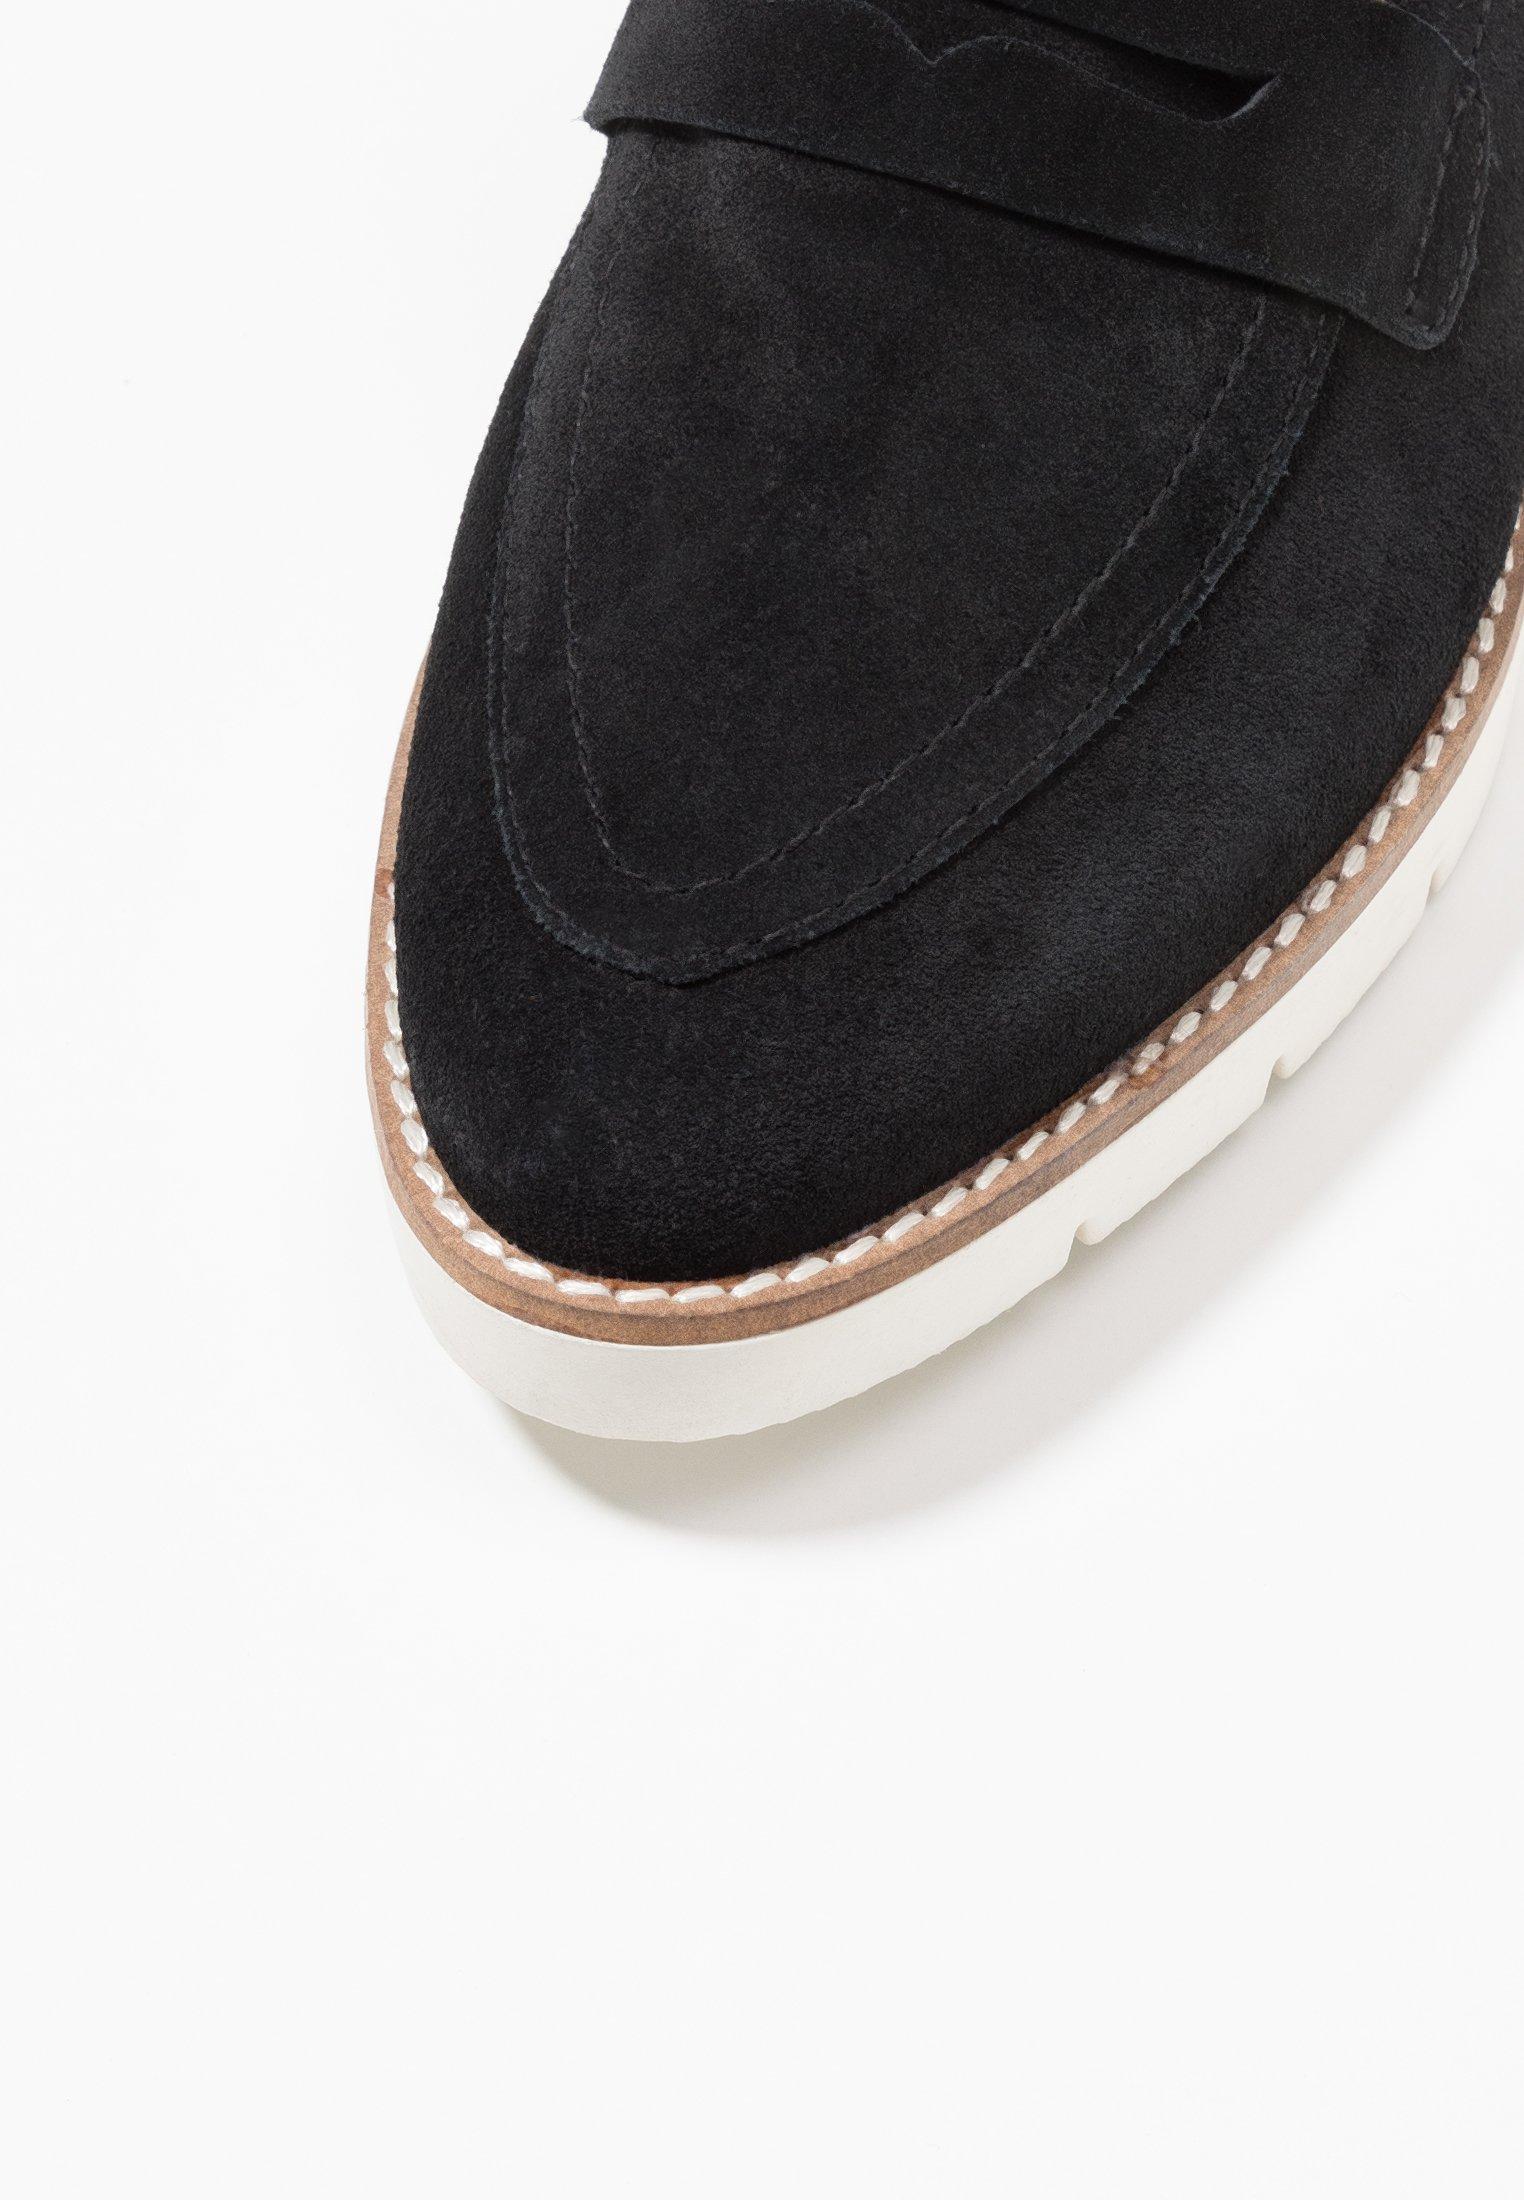 Bianco Biacarla Loafer - Mocassins Black